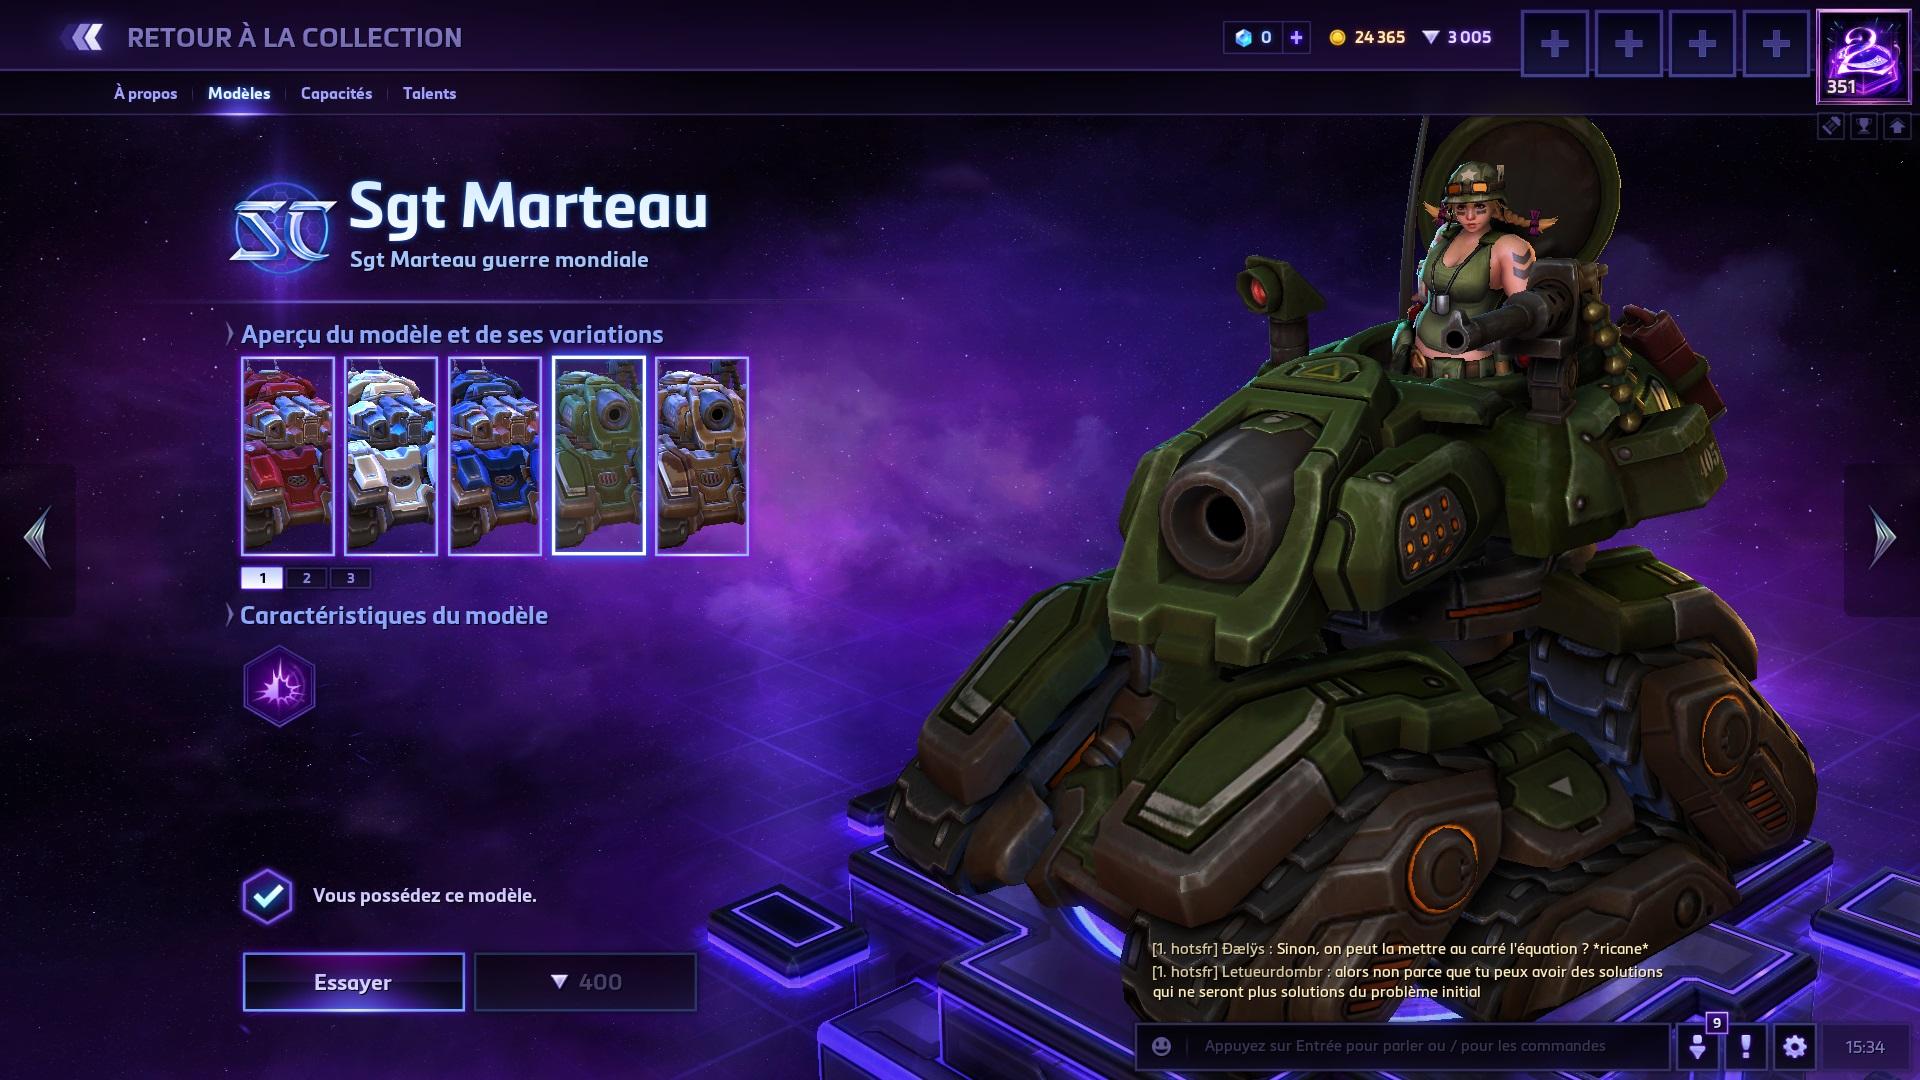 Build Marteau Hots